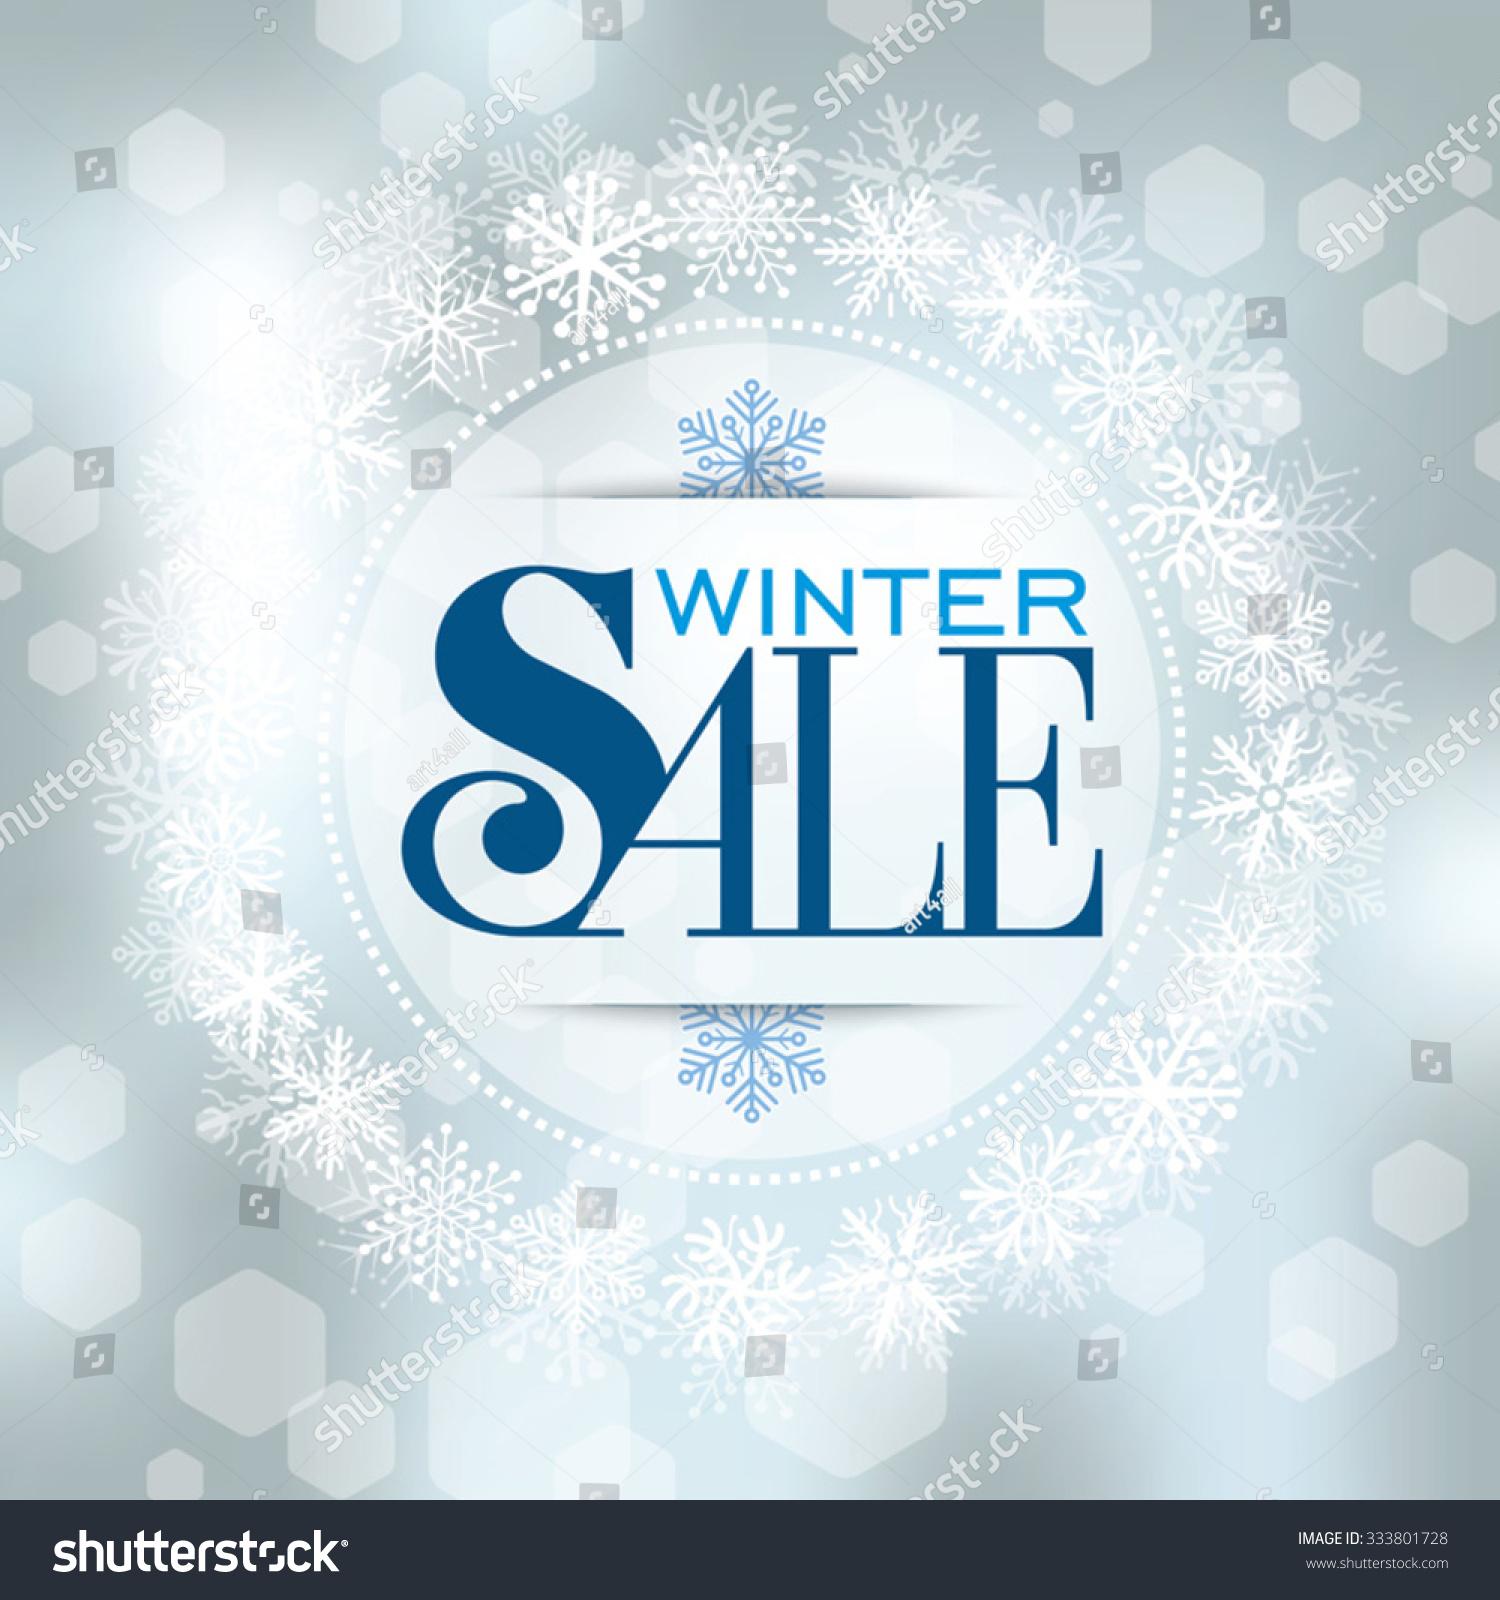 winter sale poster design template background のベクター画像素材